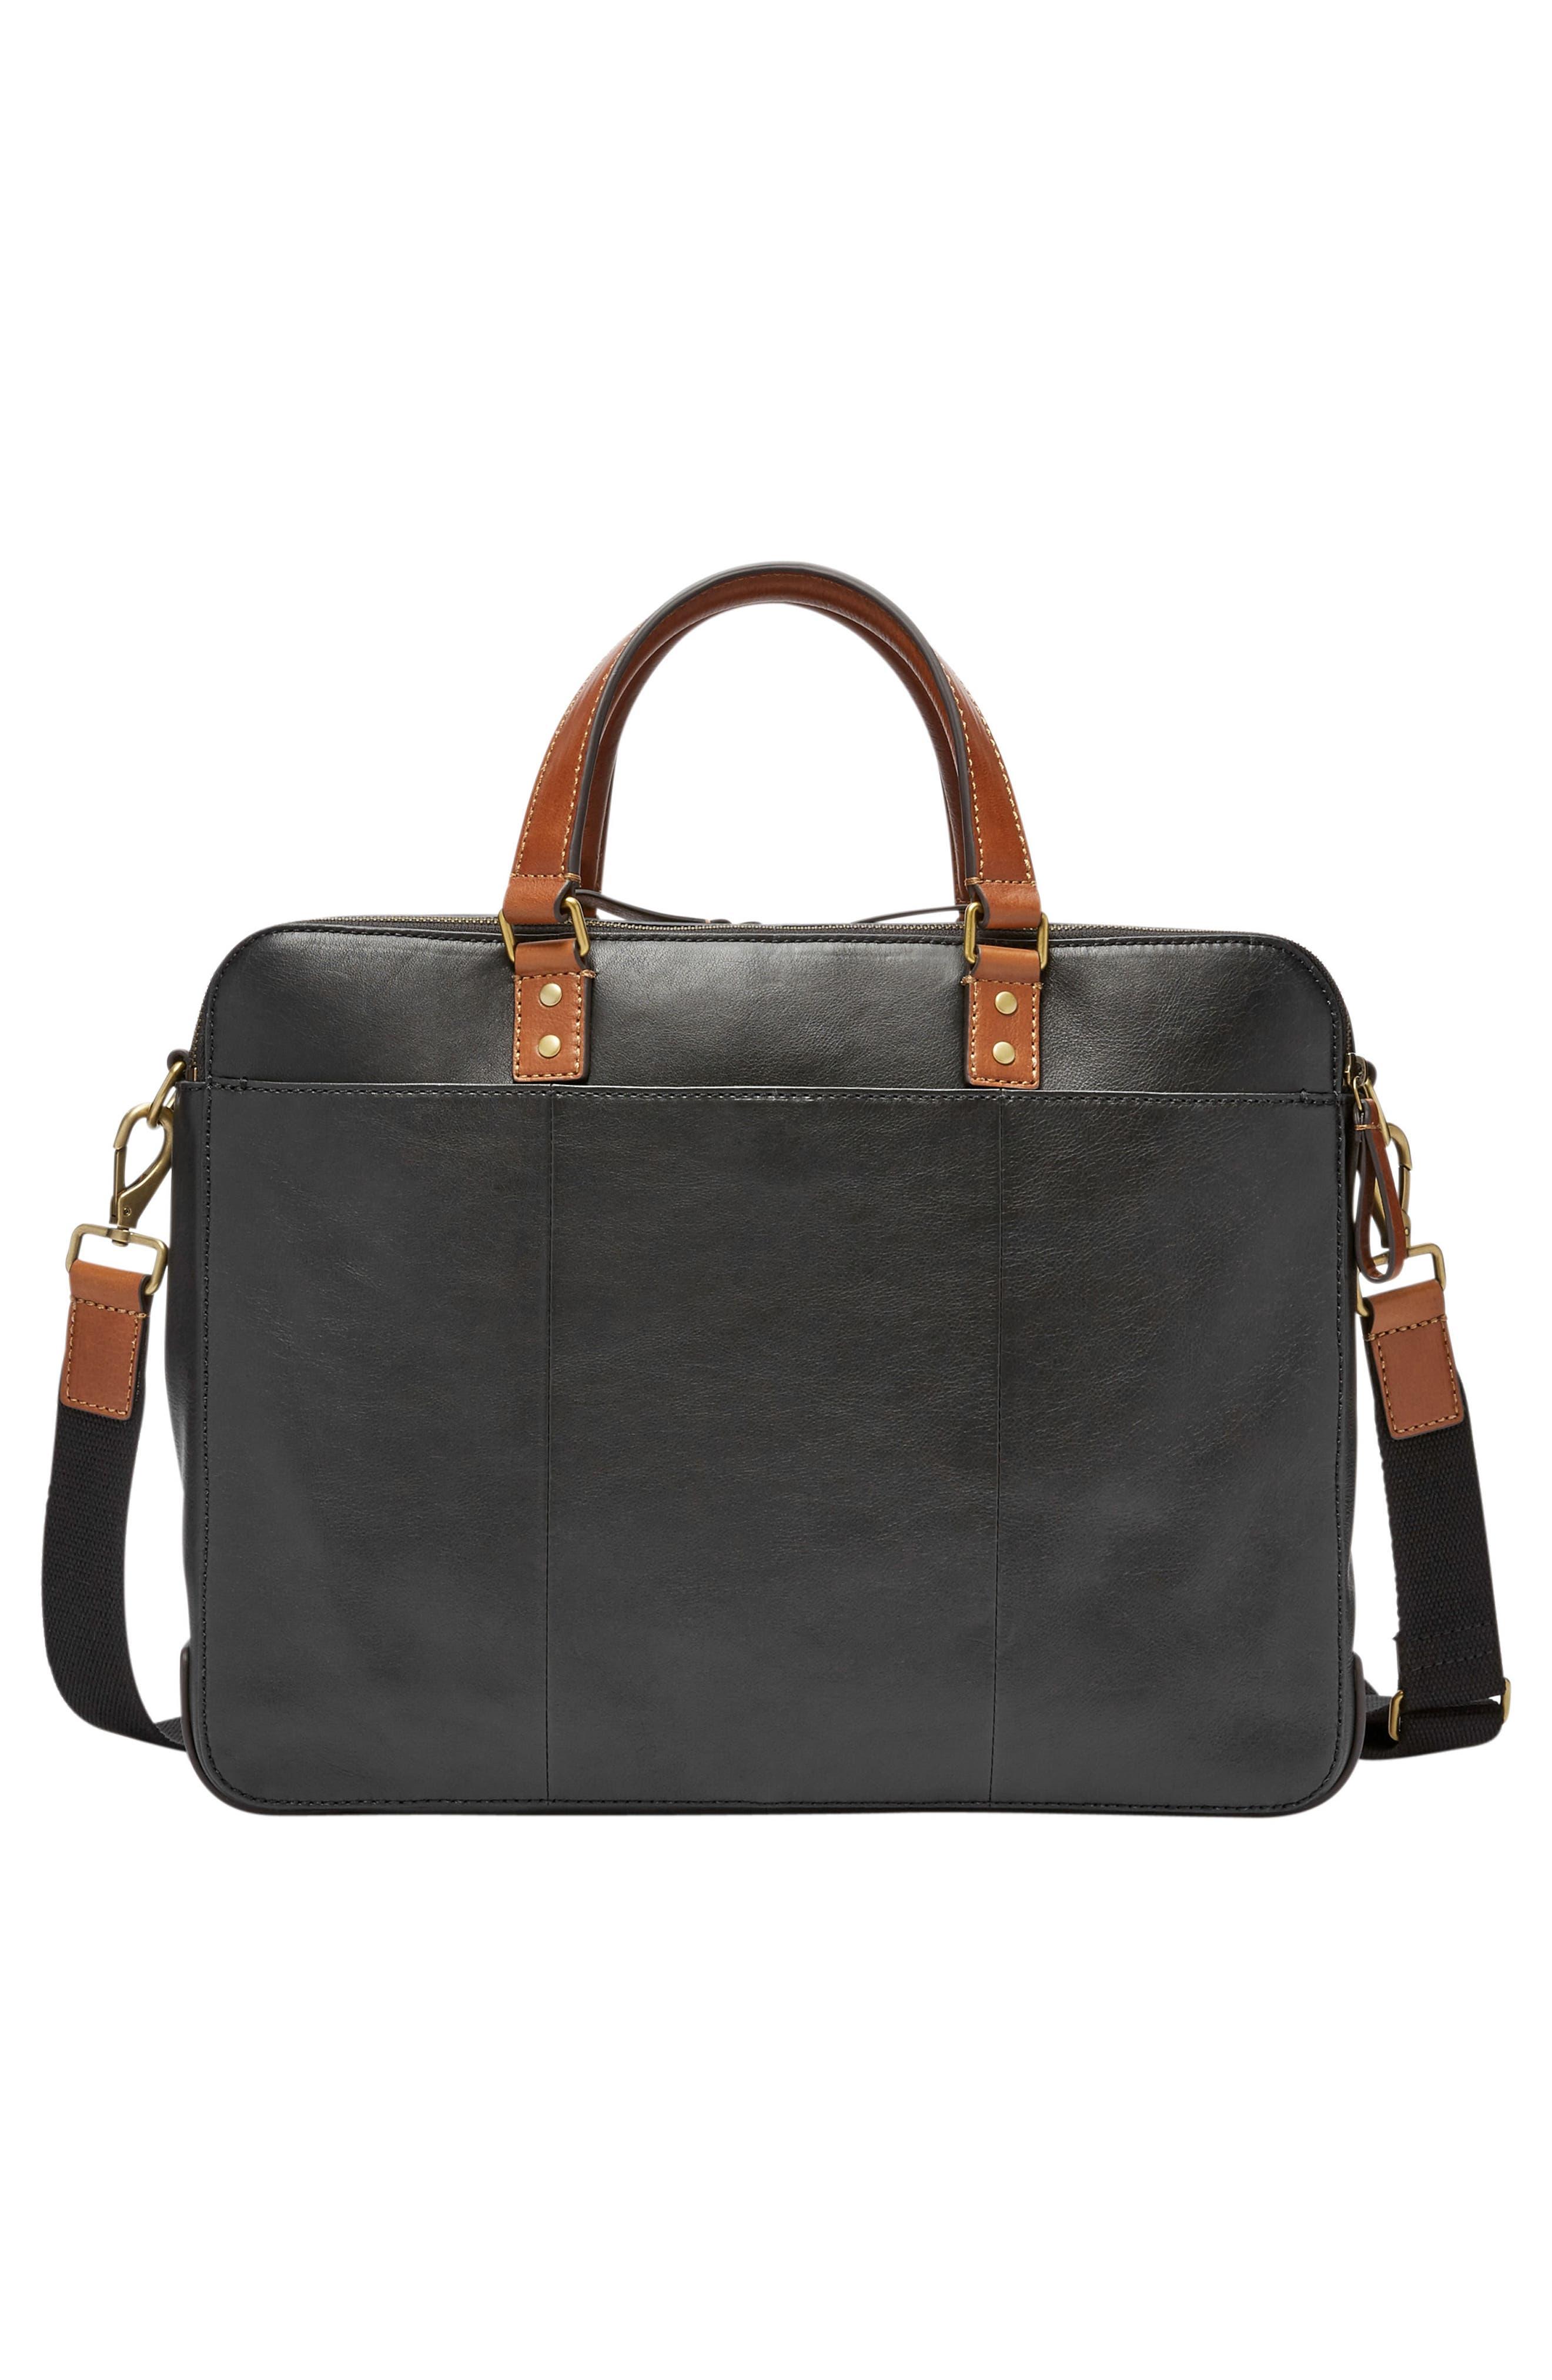 Defender Leather Briefcase,                             Alternate thumbnail 2, color,                             BLACK